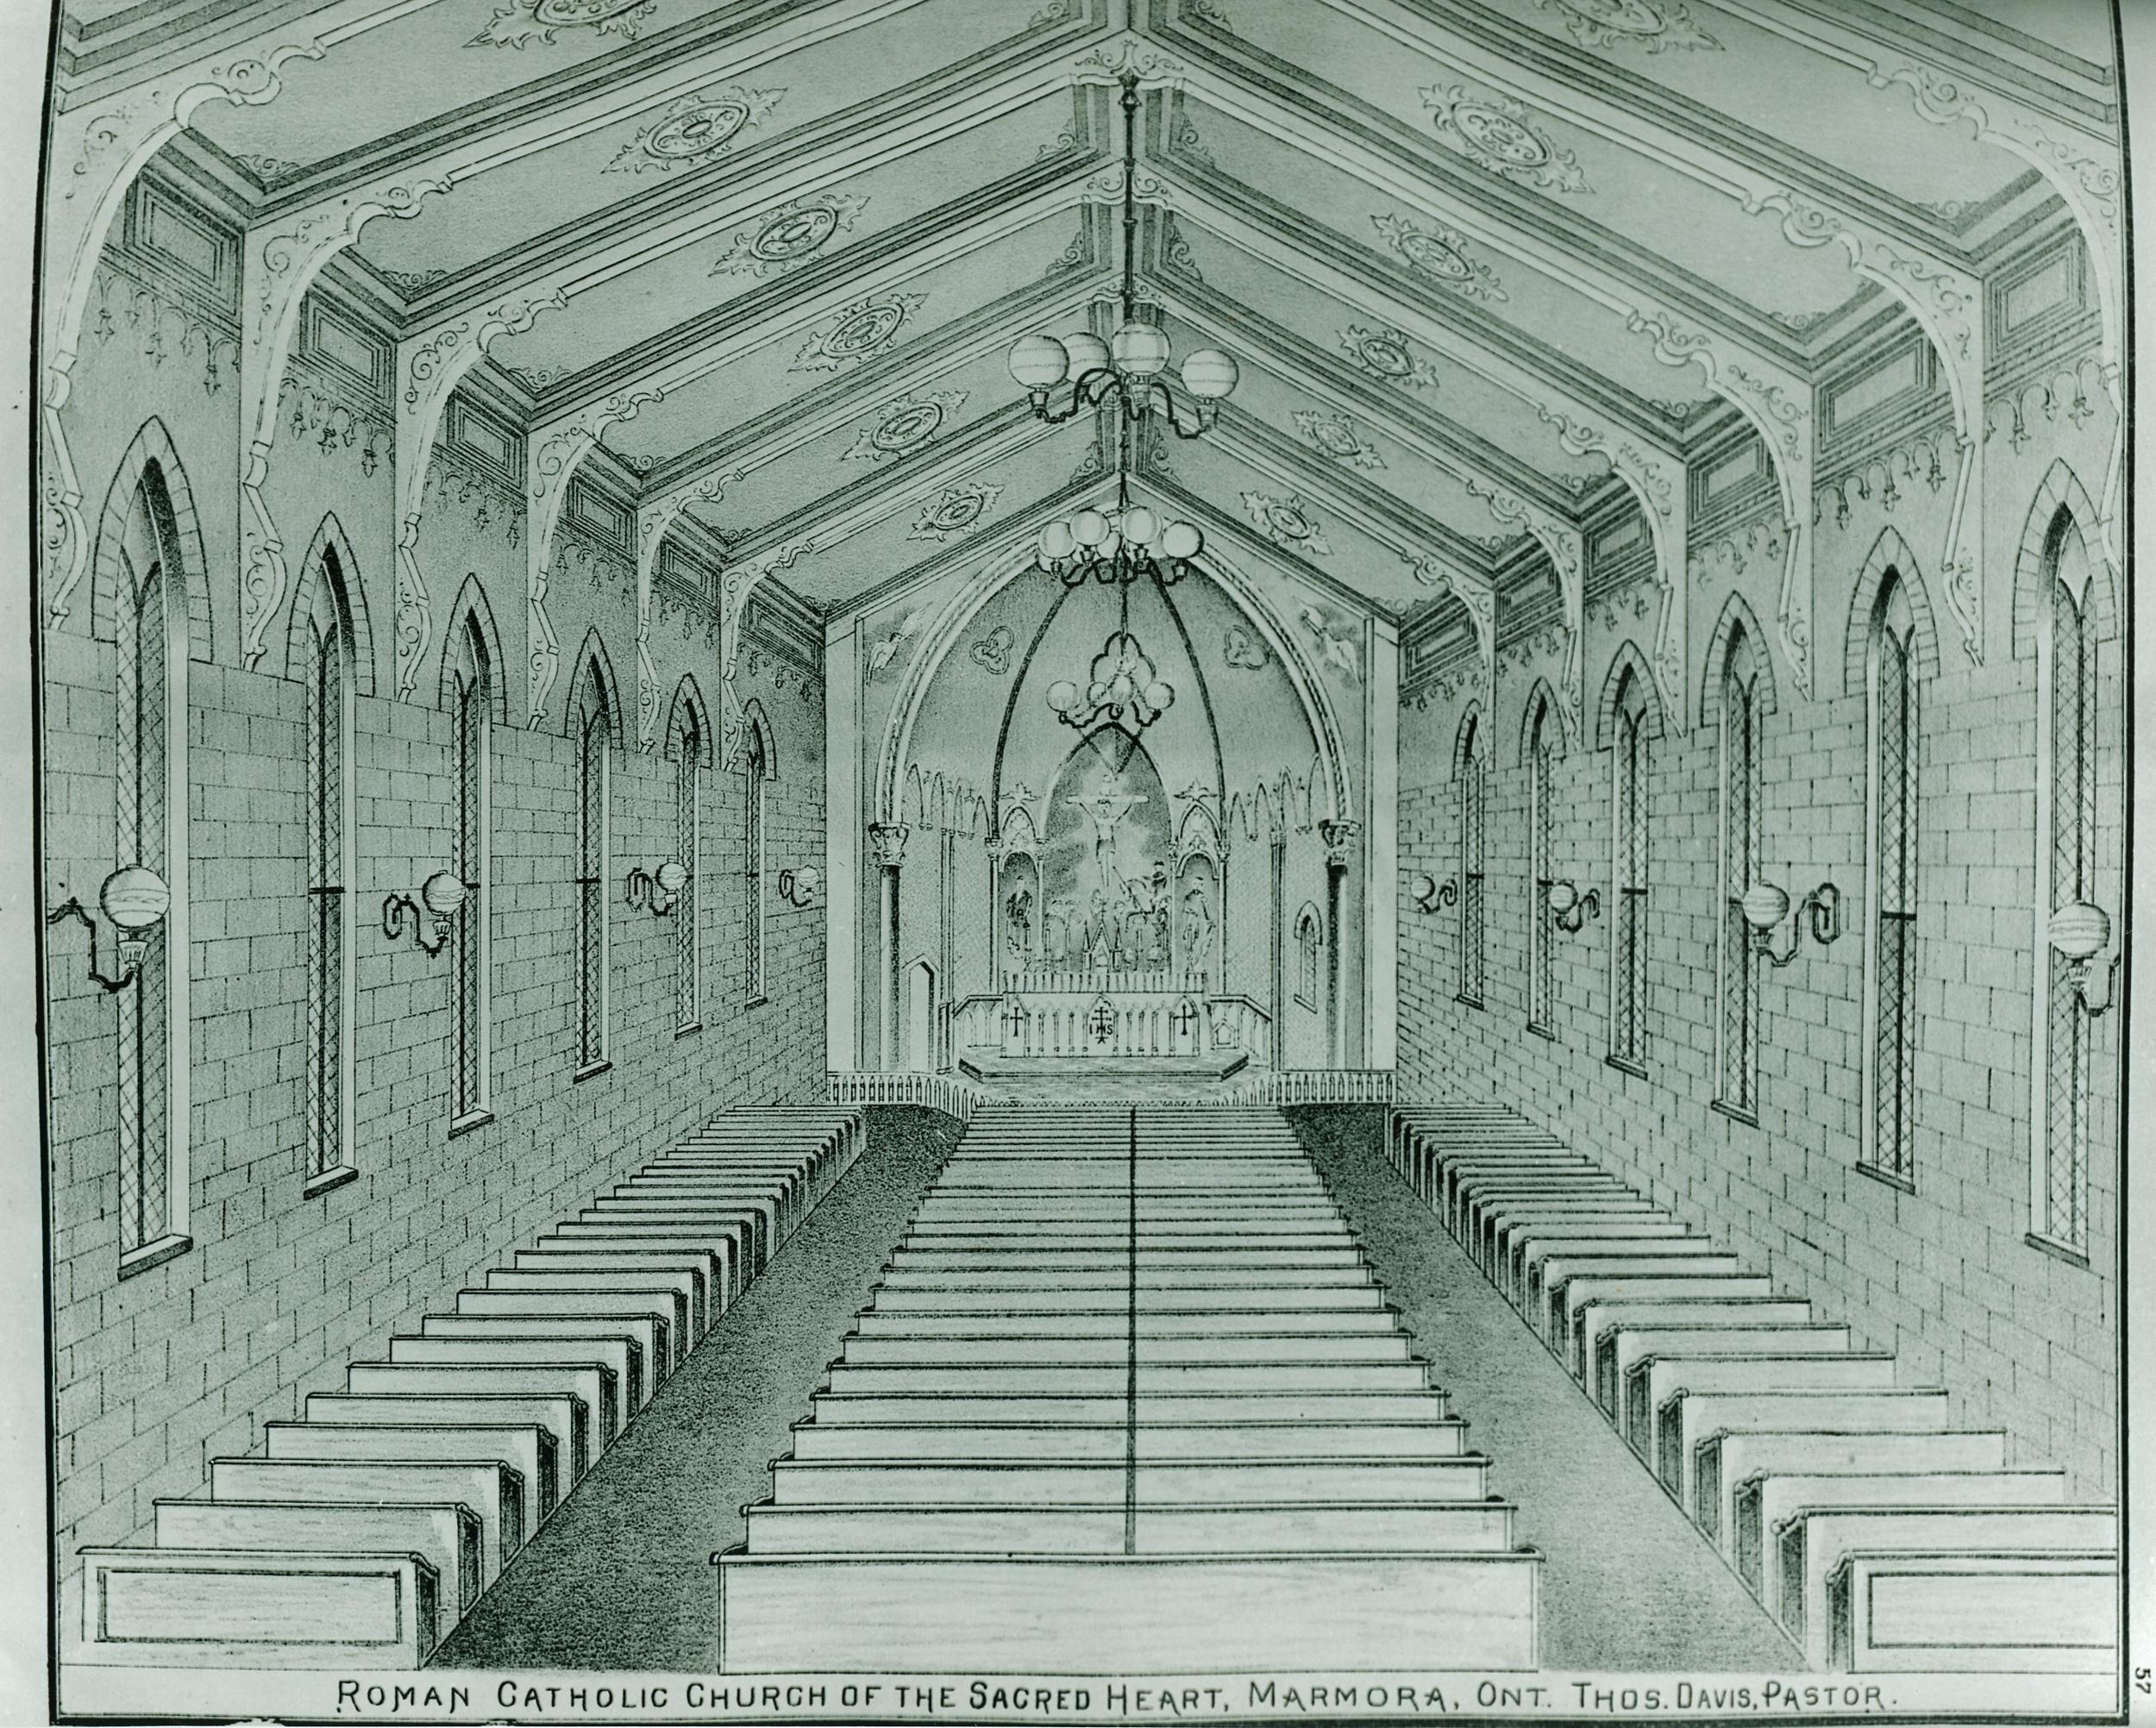 Sketch in Historical Hastings Atlas of interior of brick church built in 1875